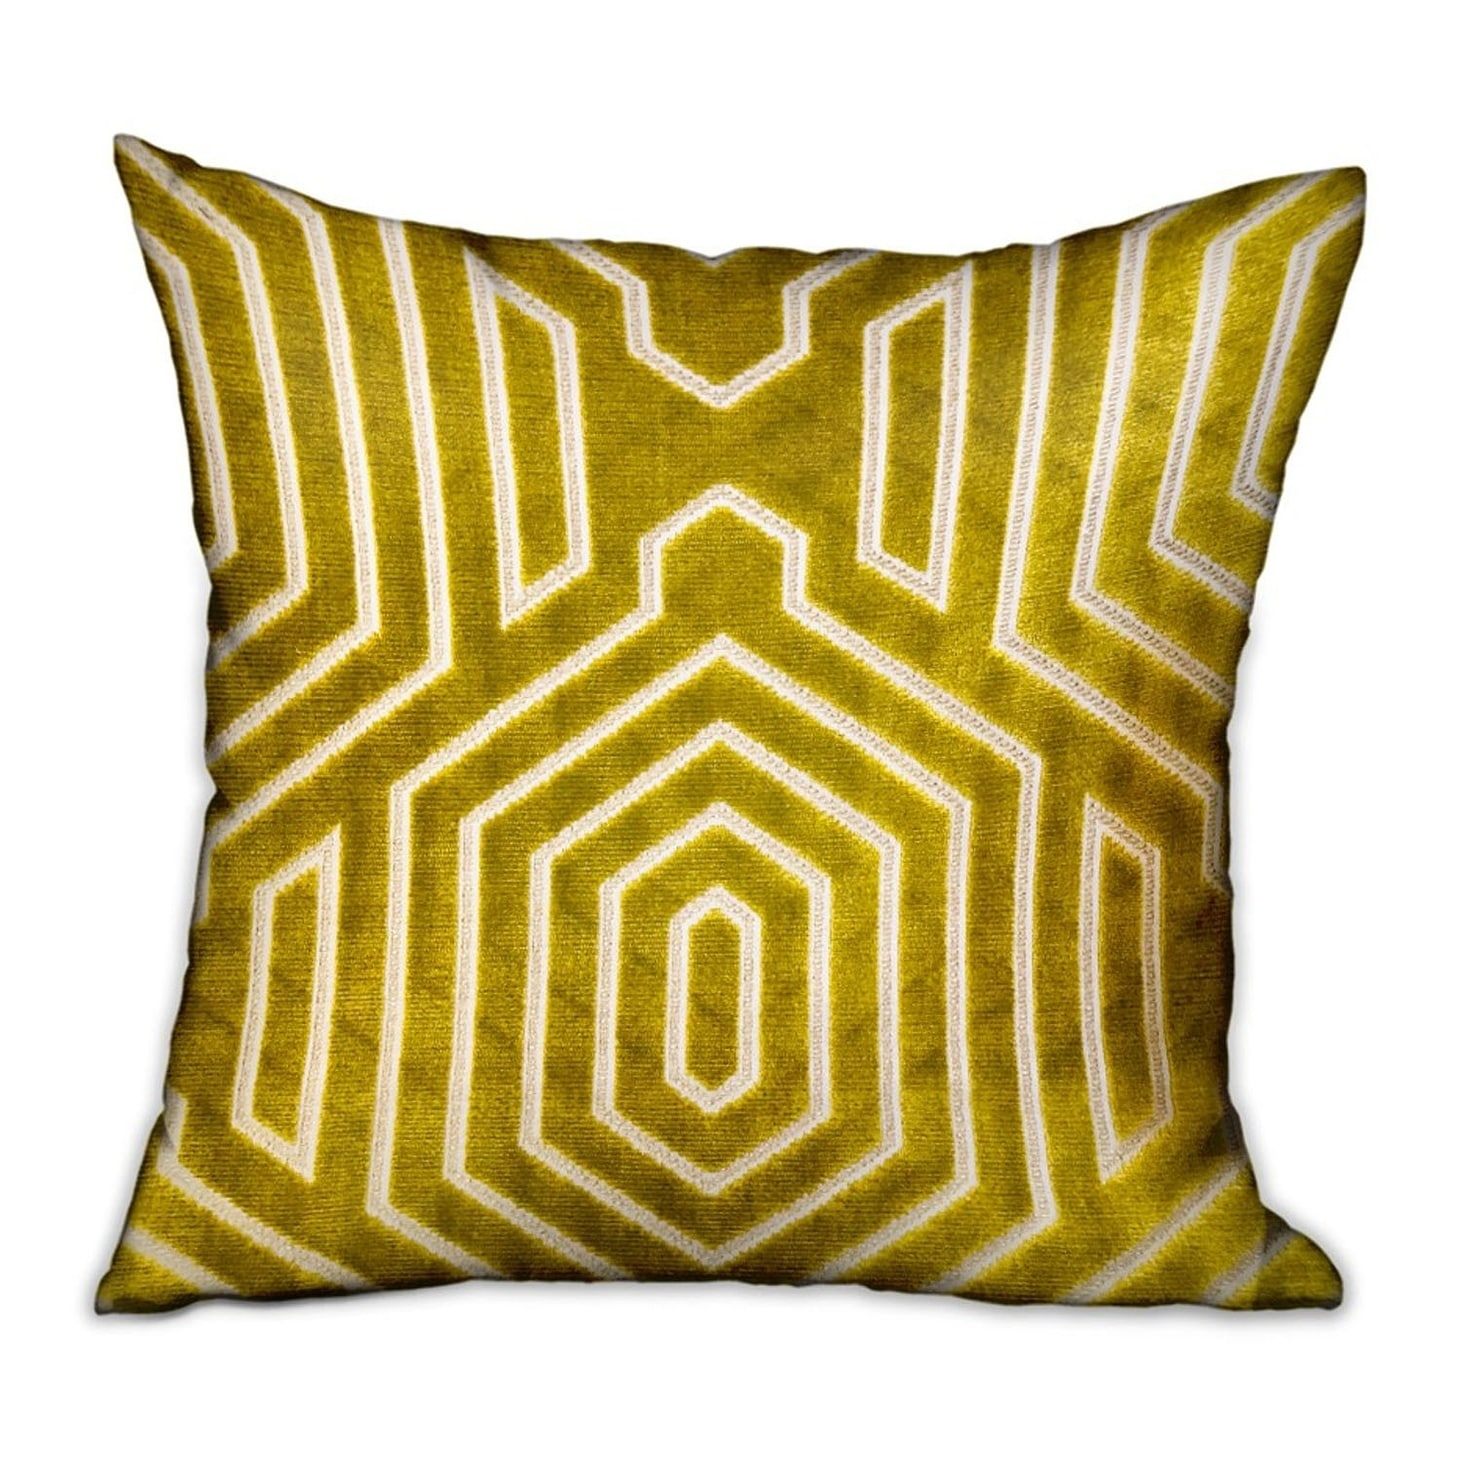 Plutus Goldenrod Velvet Gold Geometric Luxury Decorative Throw Pillow